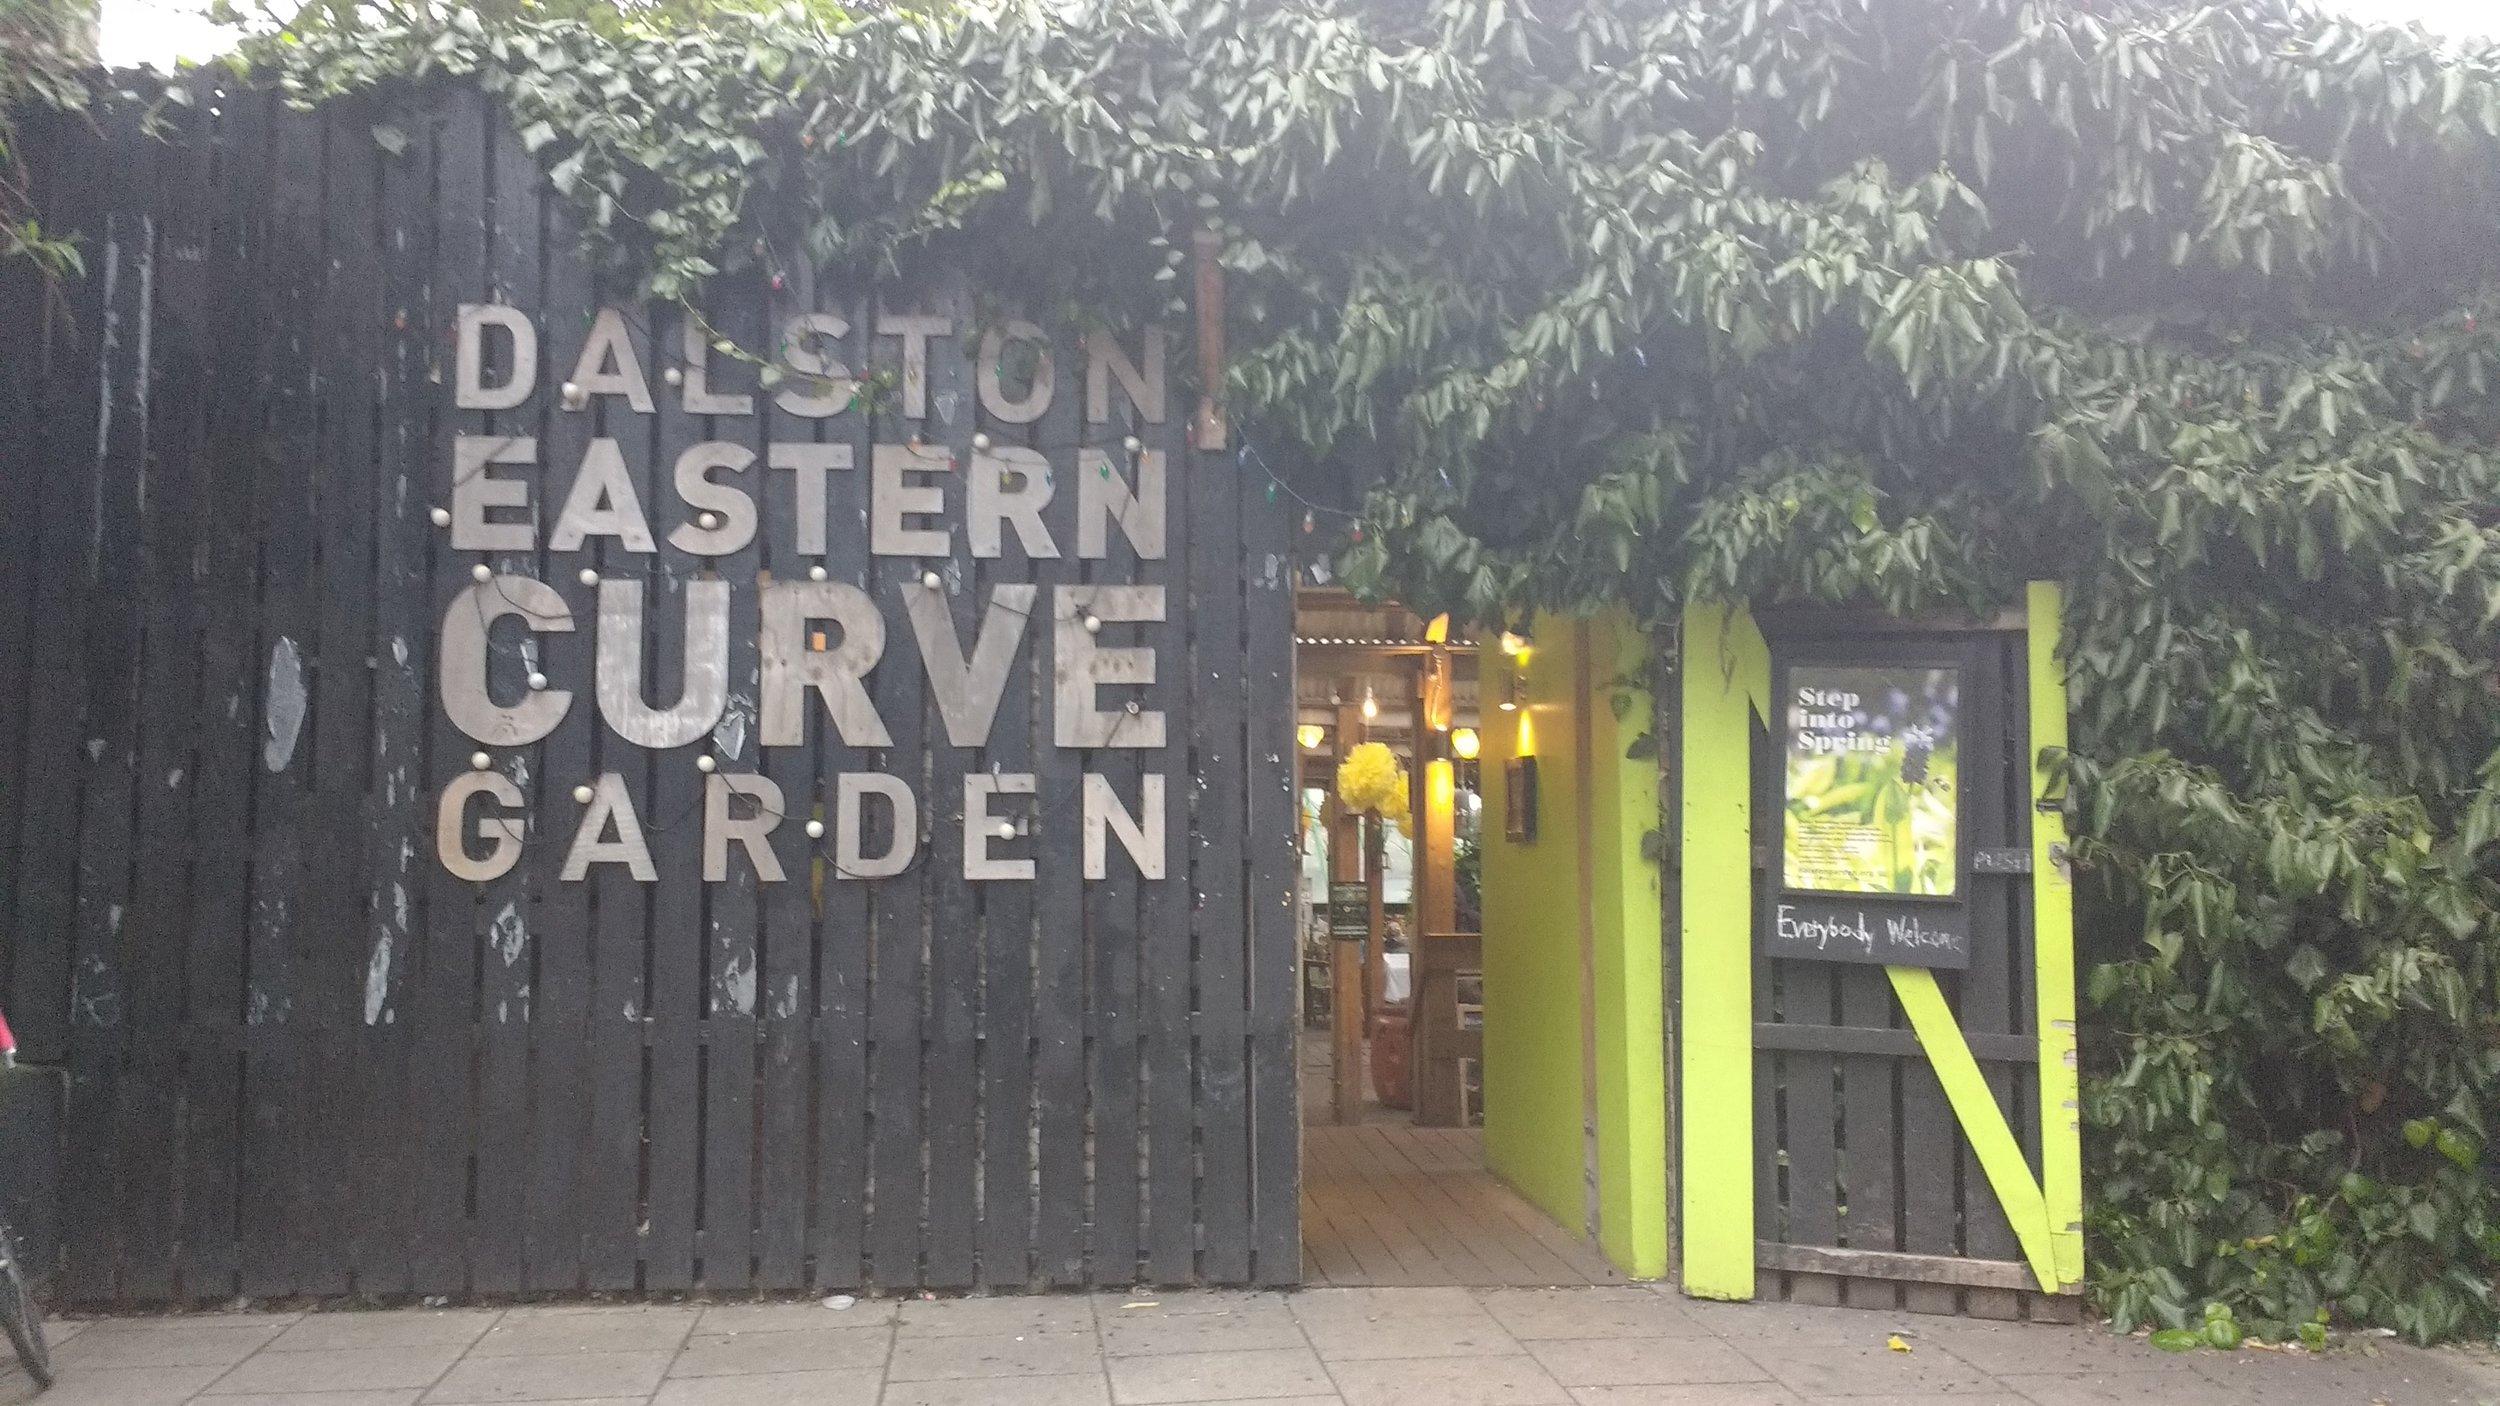 Dalston Eastern Curve Garden entrance